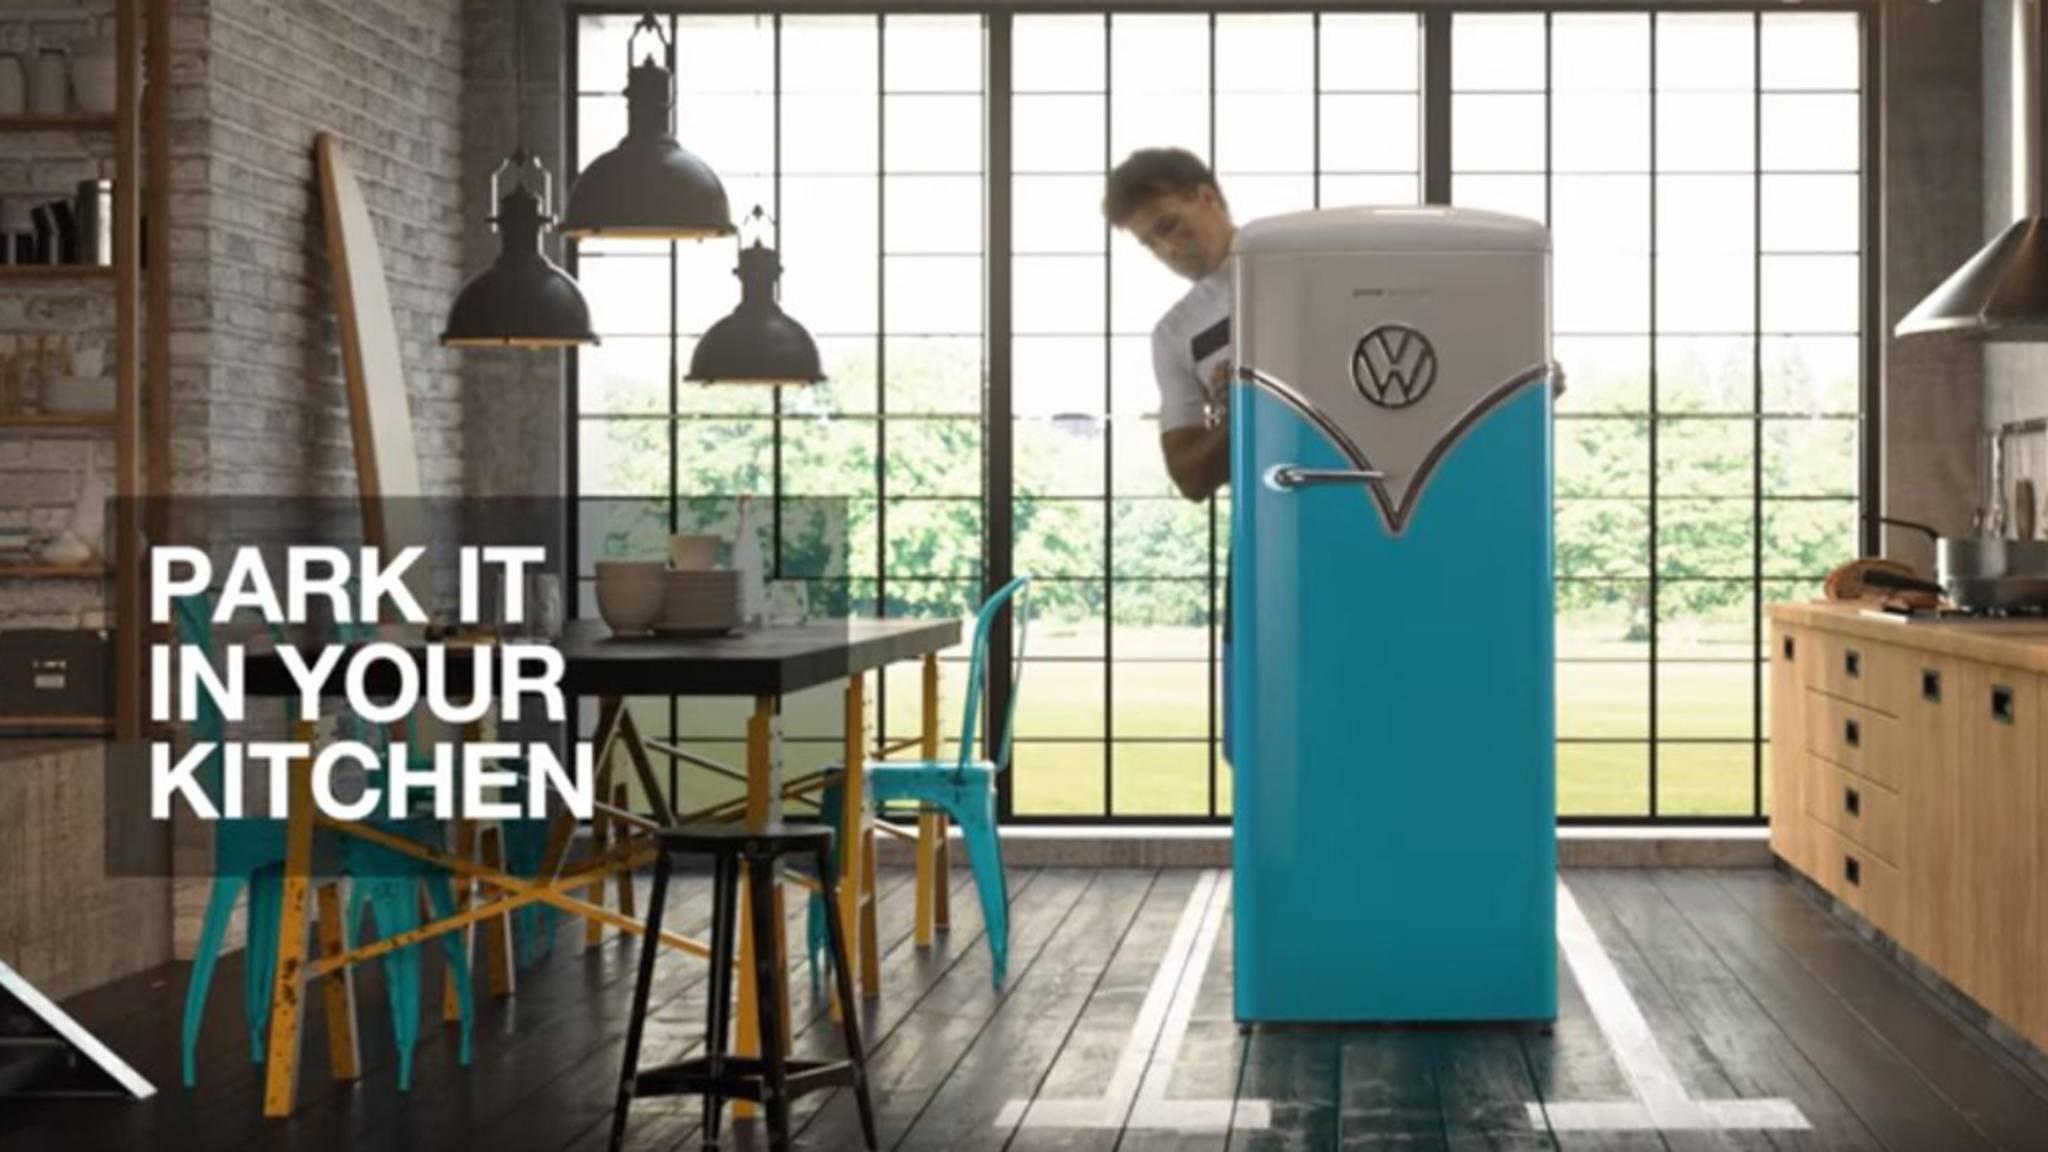 Retro Kühlschrank Vw Bulli : Küchen umstyling go retro gorenje